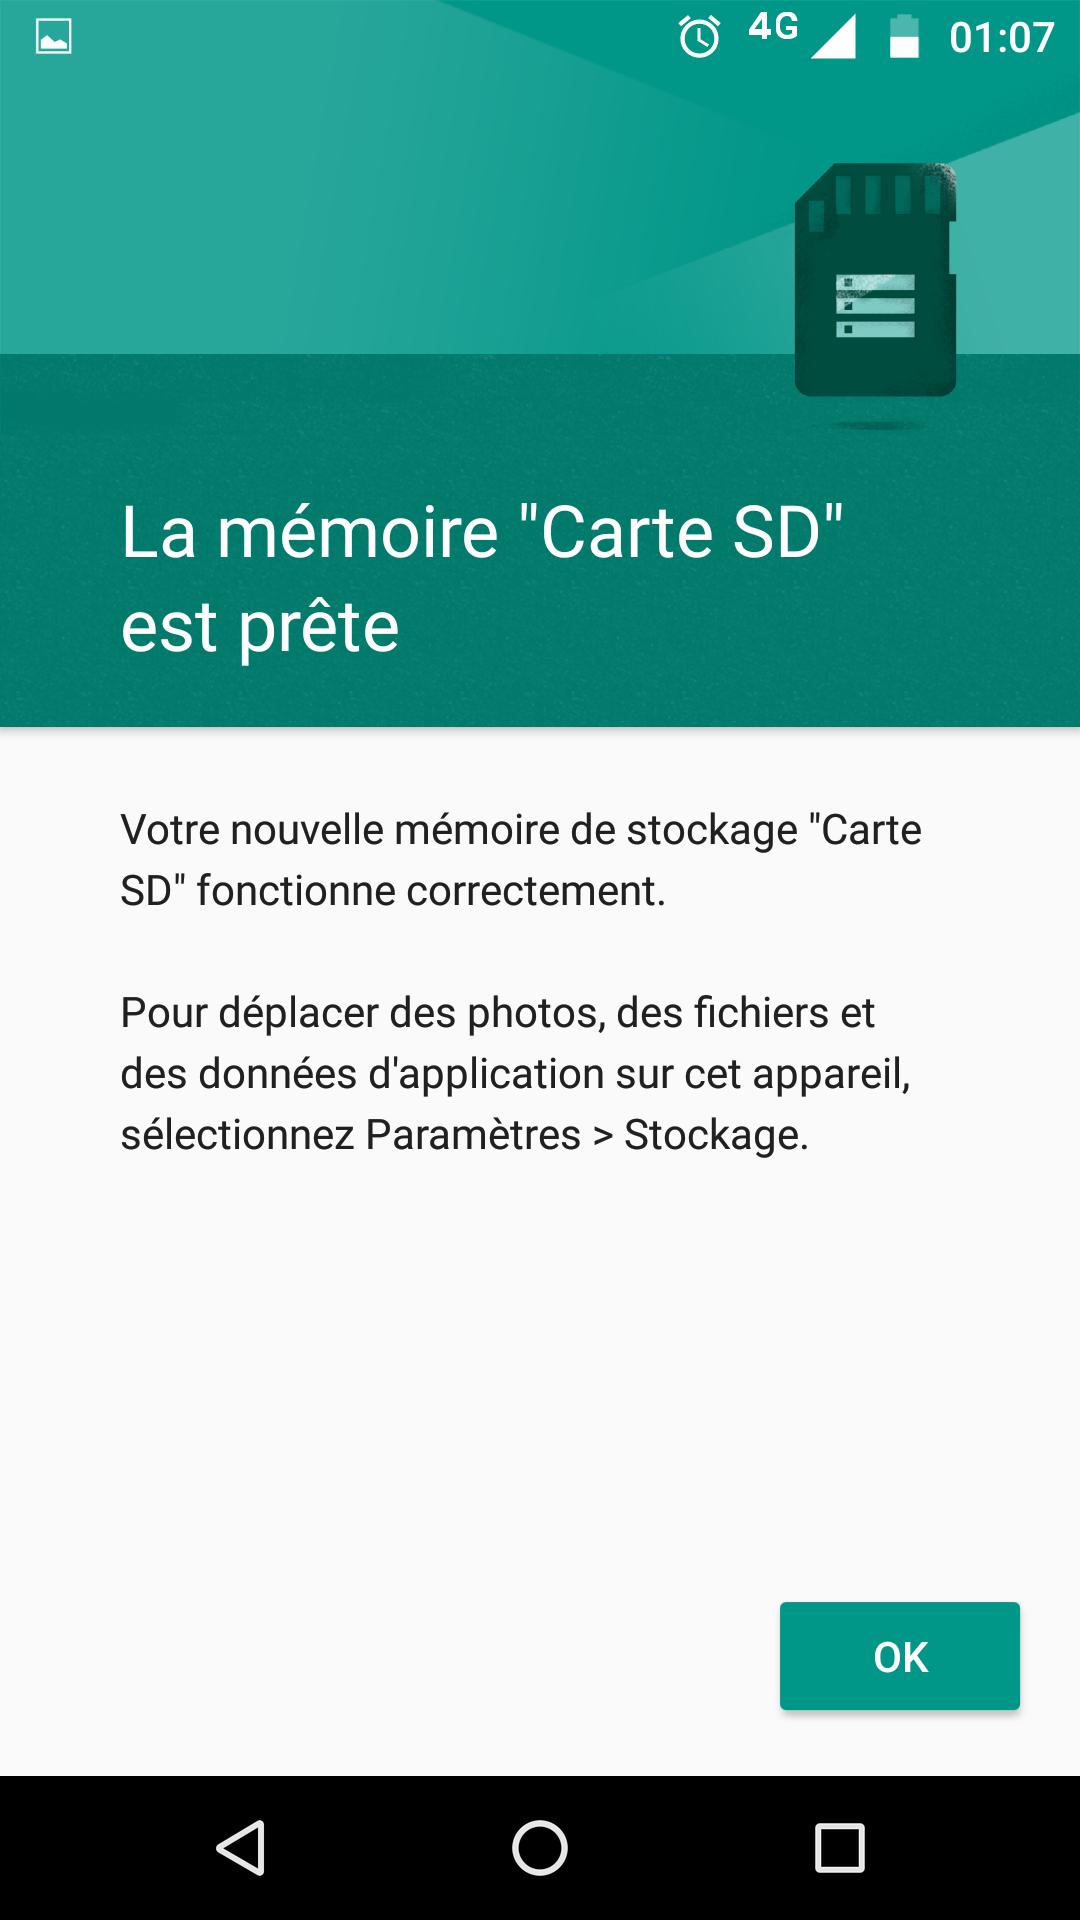 fusionner carte sd et memoire interne Android   fusion de la mémoire interne et de la carte SD